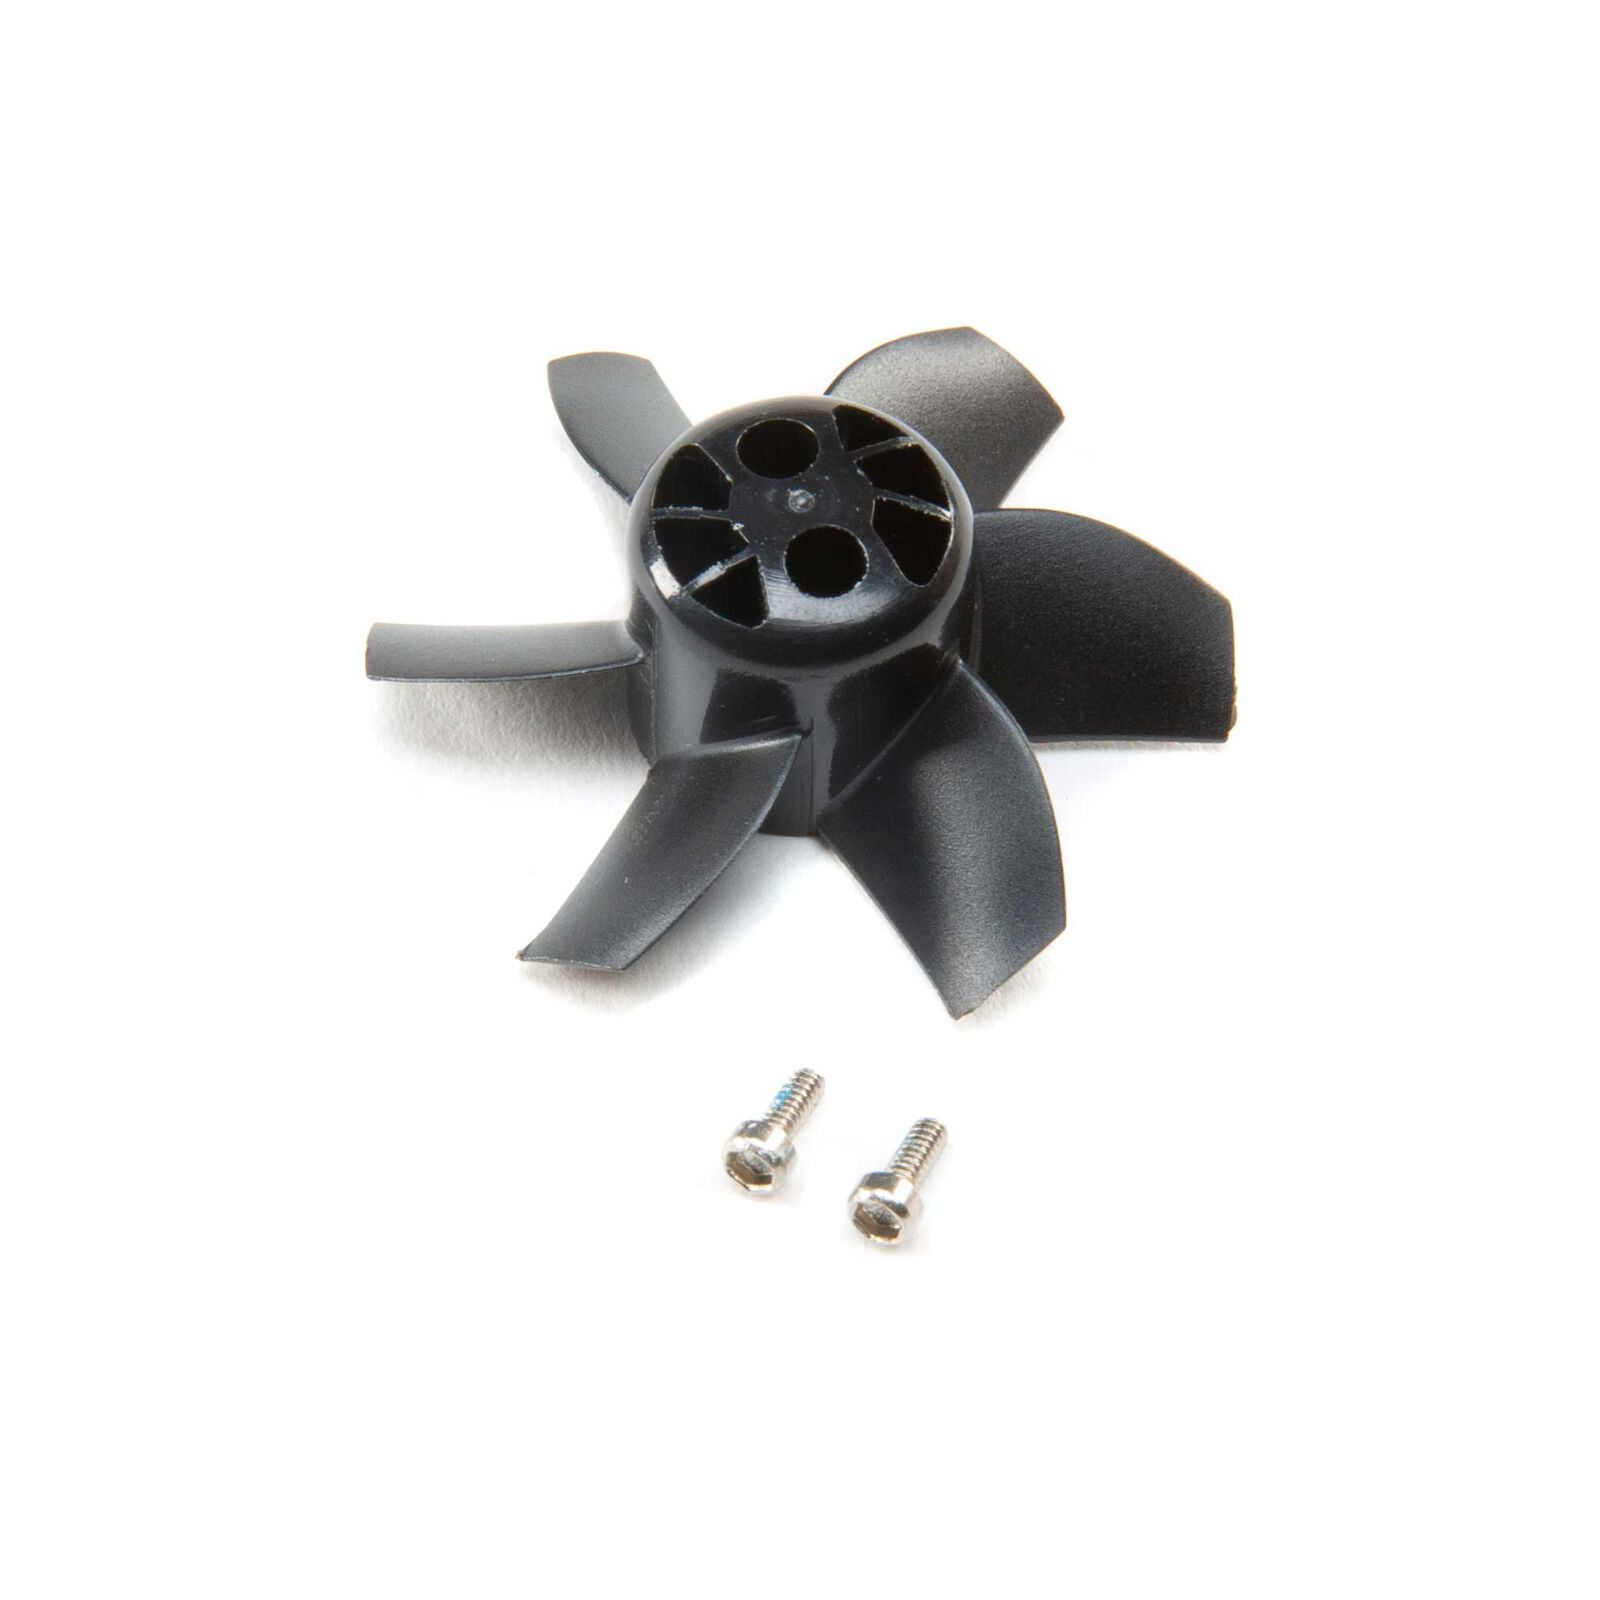 6-Blade Rotor, 30mm